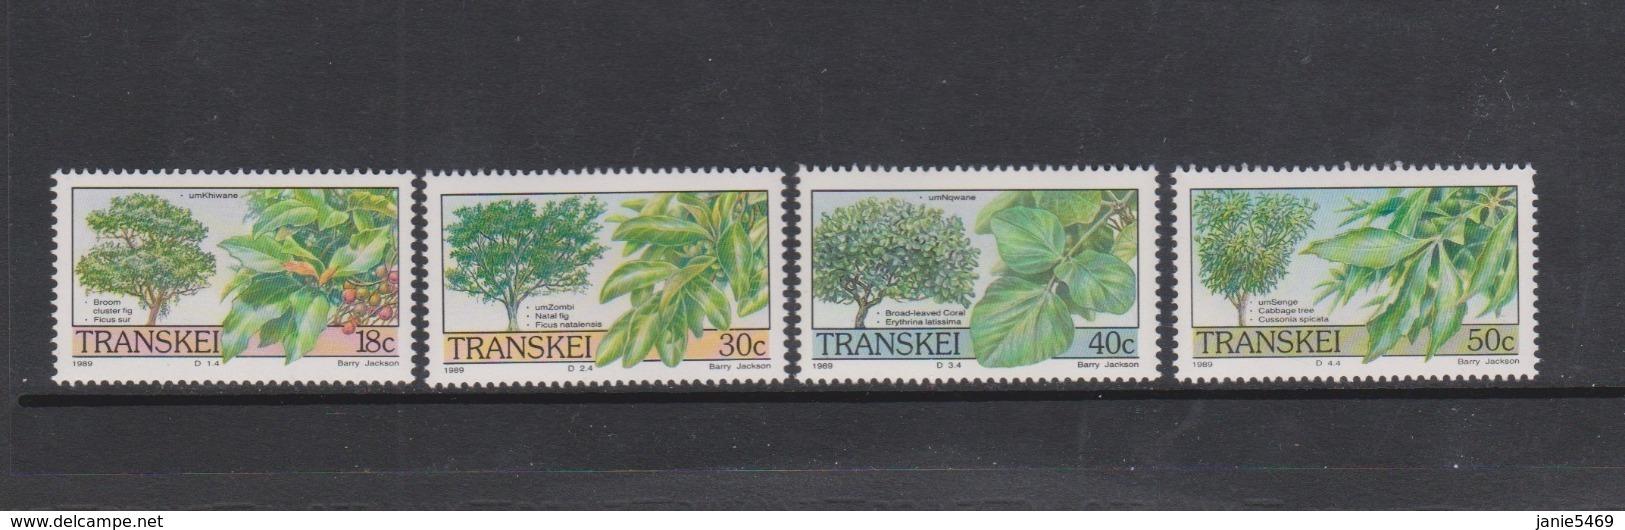 South Africa-Transkei SG 241-244 1989 Trees,Mint Never Hinged - Transkei